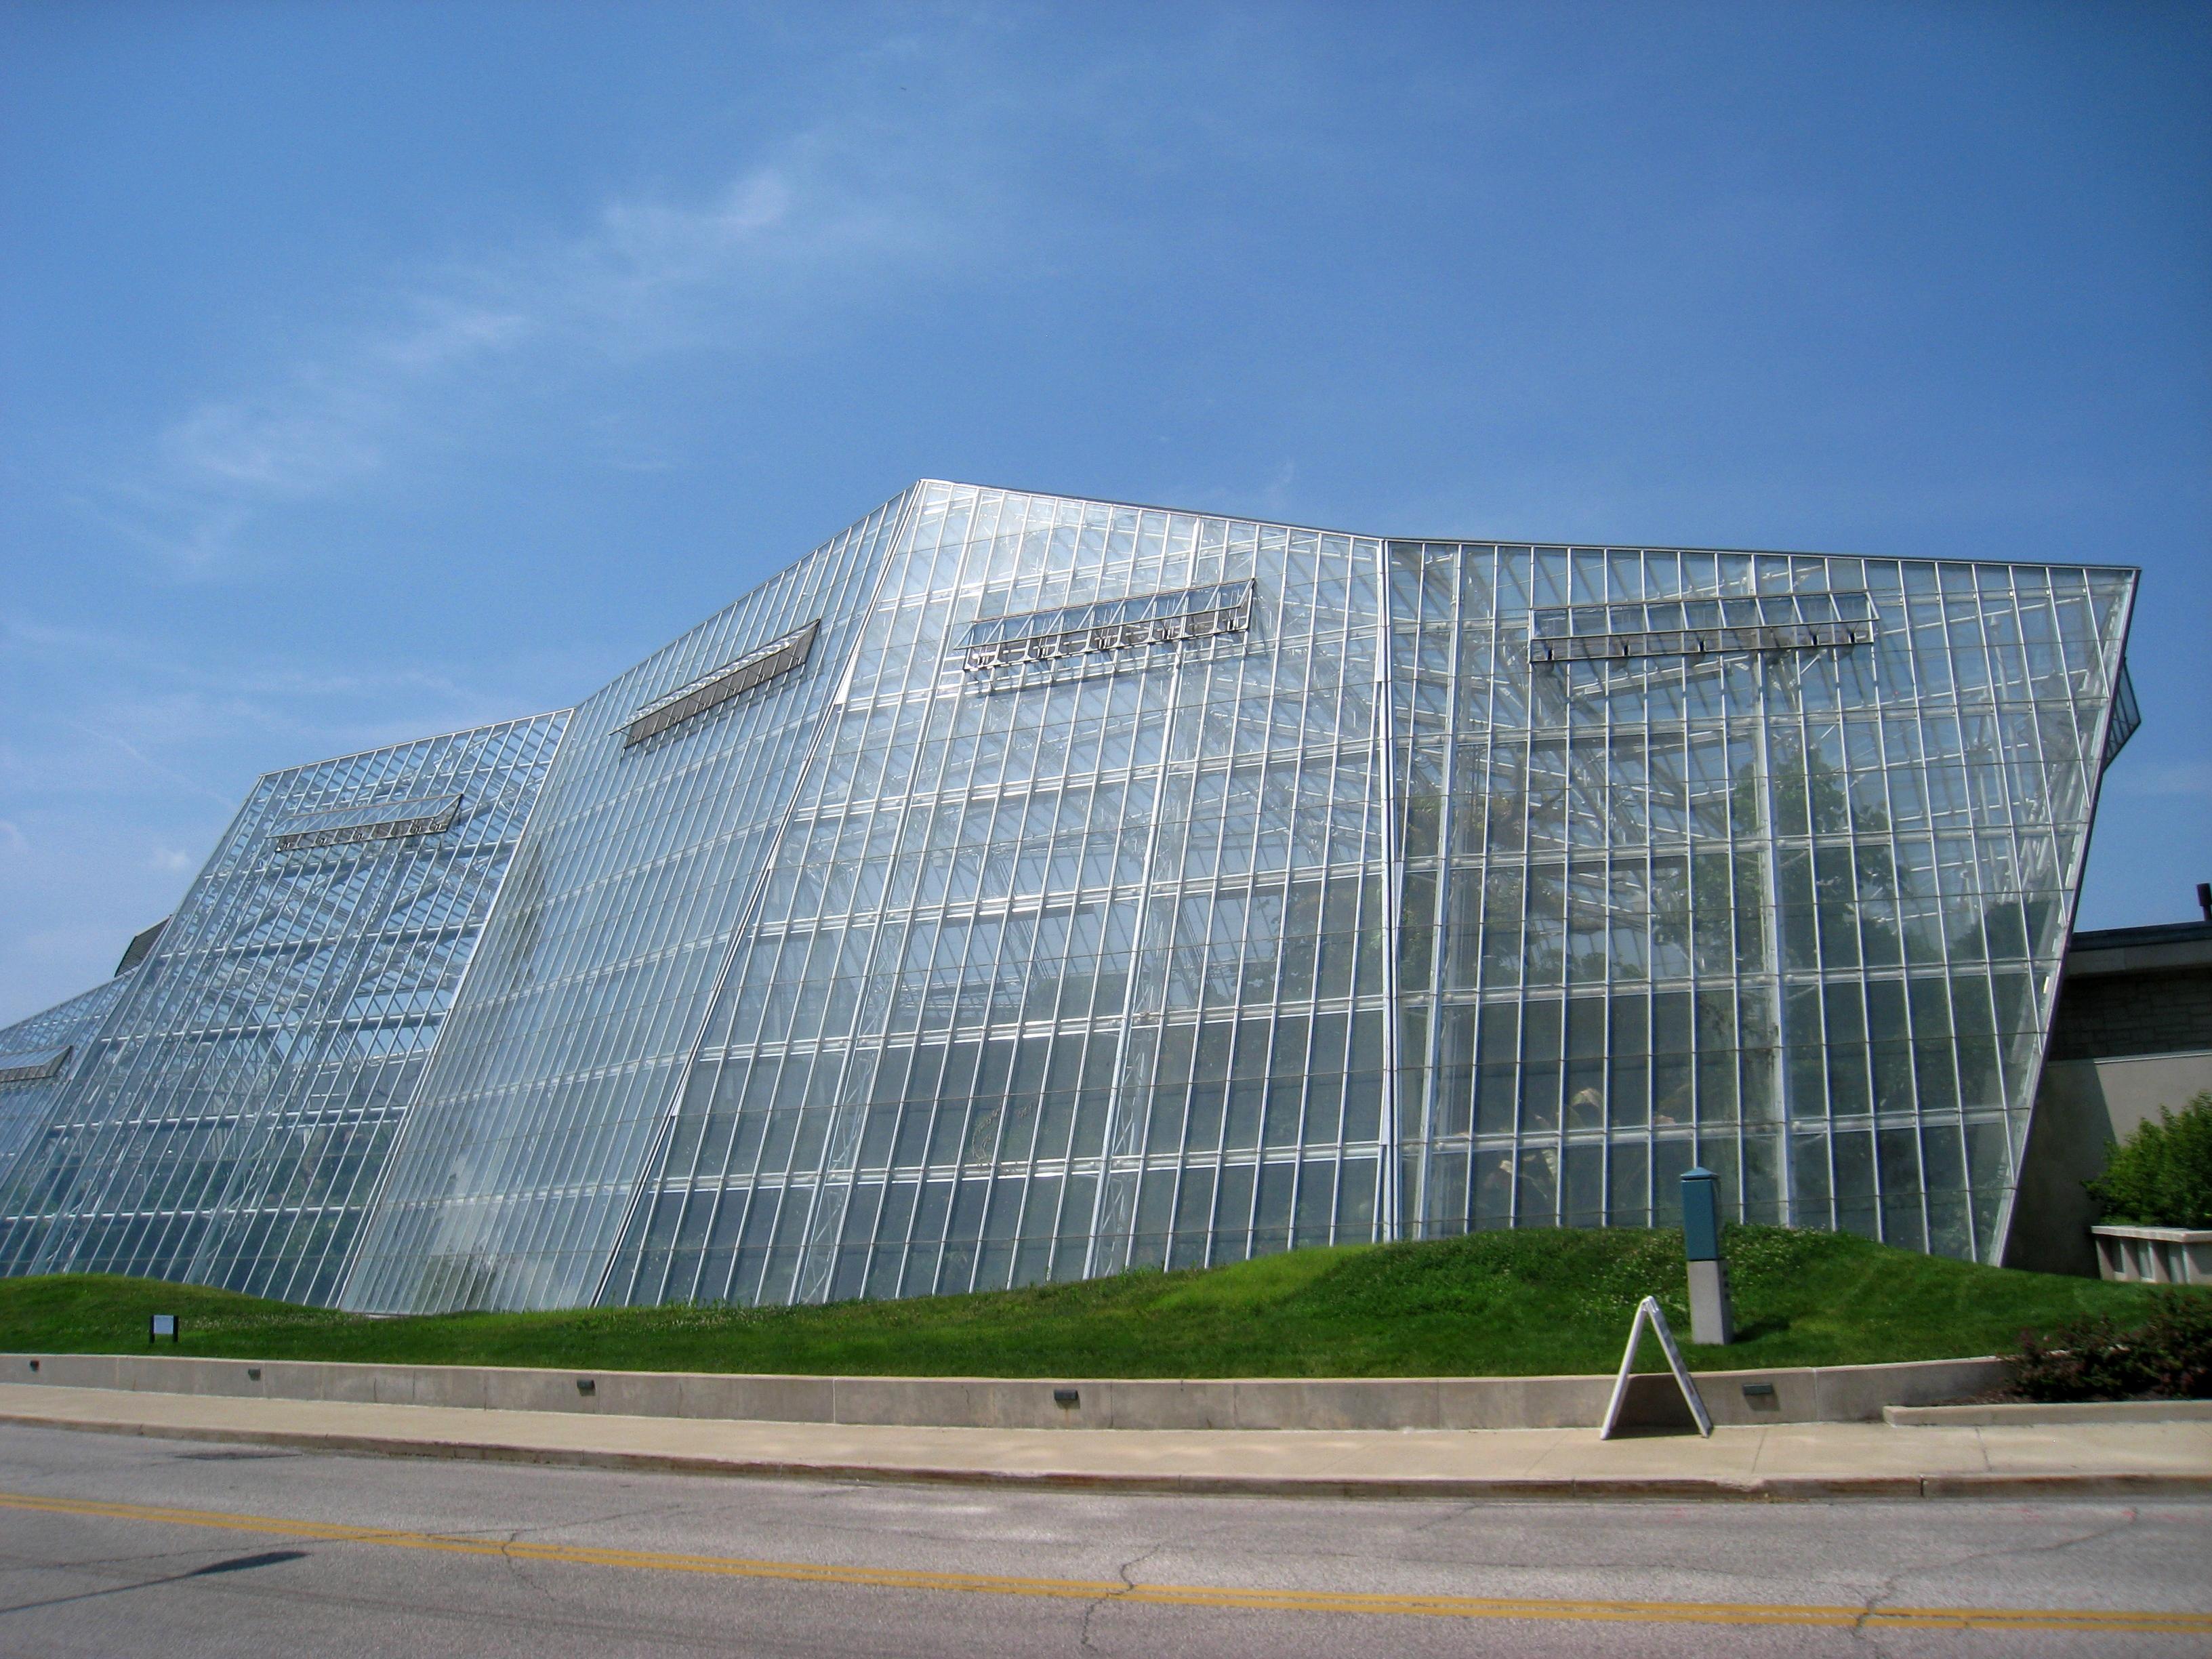 Cleveland Botanical Gardens Proflowers Blog